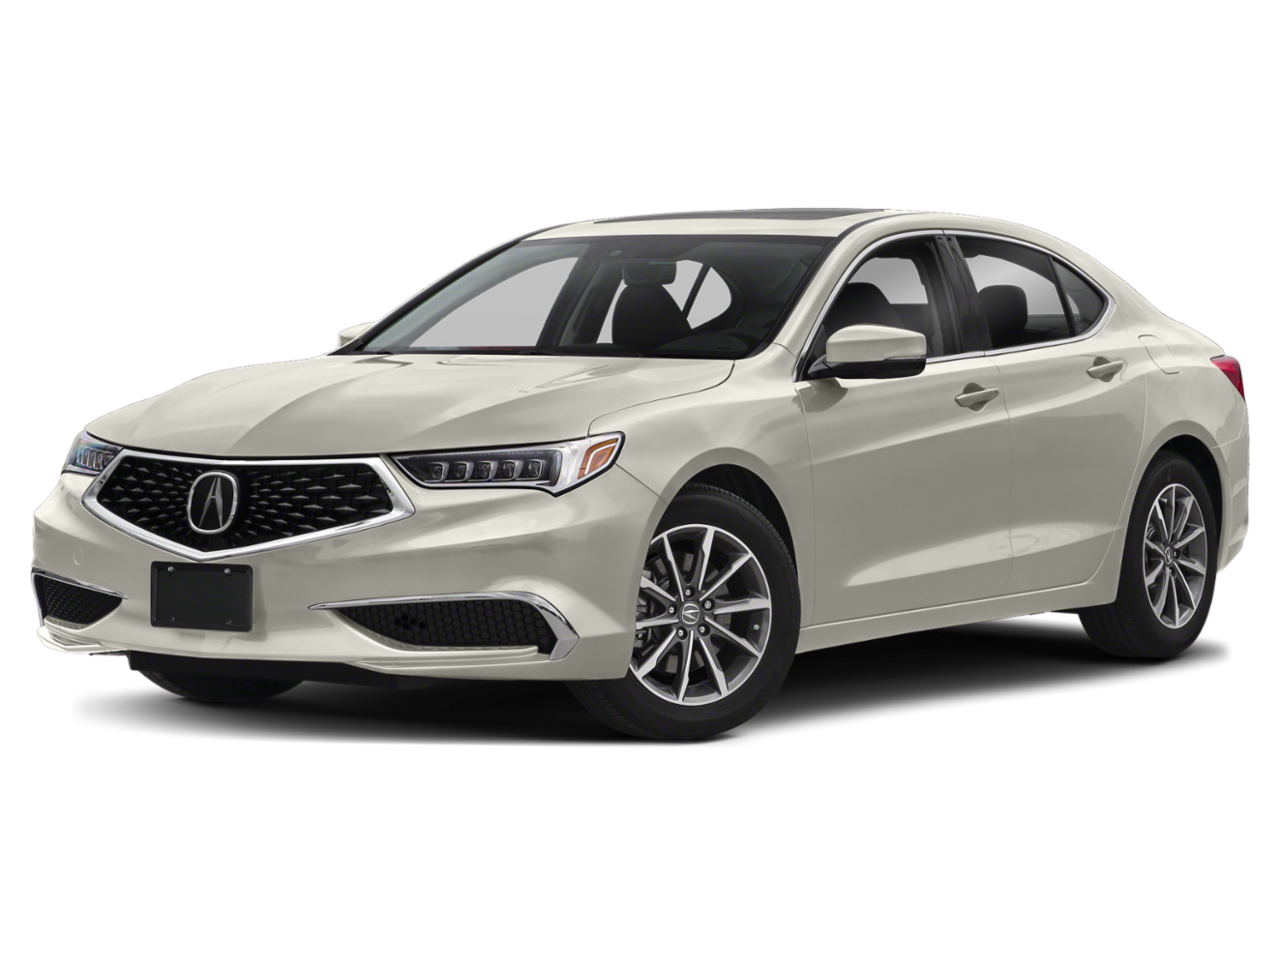 Acura 2020 TLX 2.4L FWD